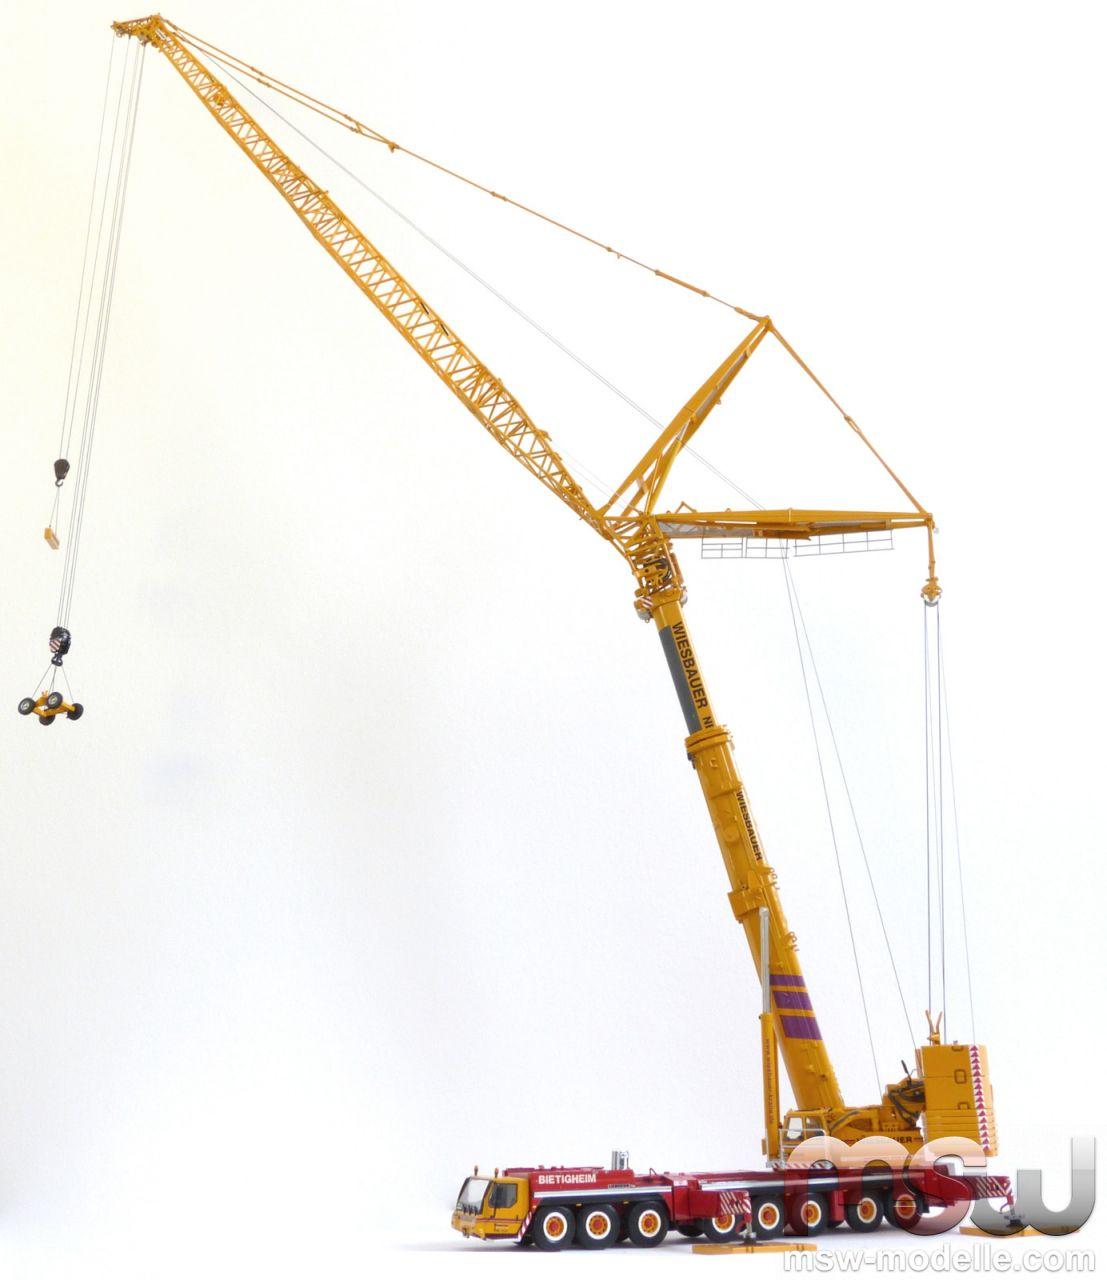 Tower Crane Advantages And Disadvantages : Modellbericht baumaschinenmodelle werbemodelle